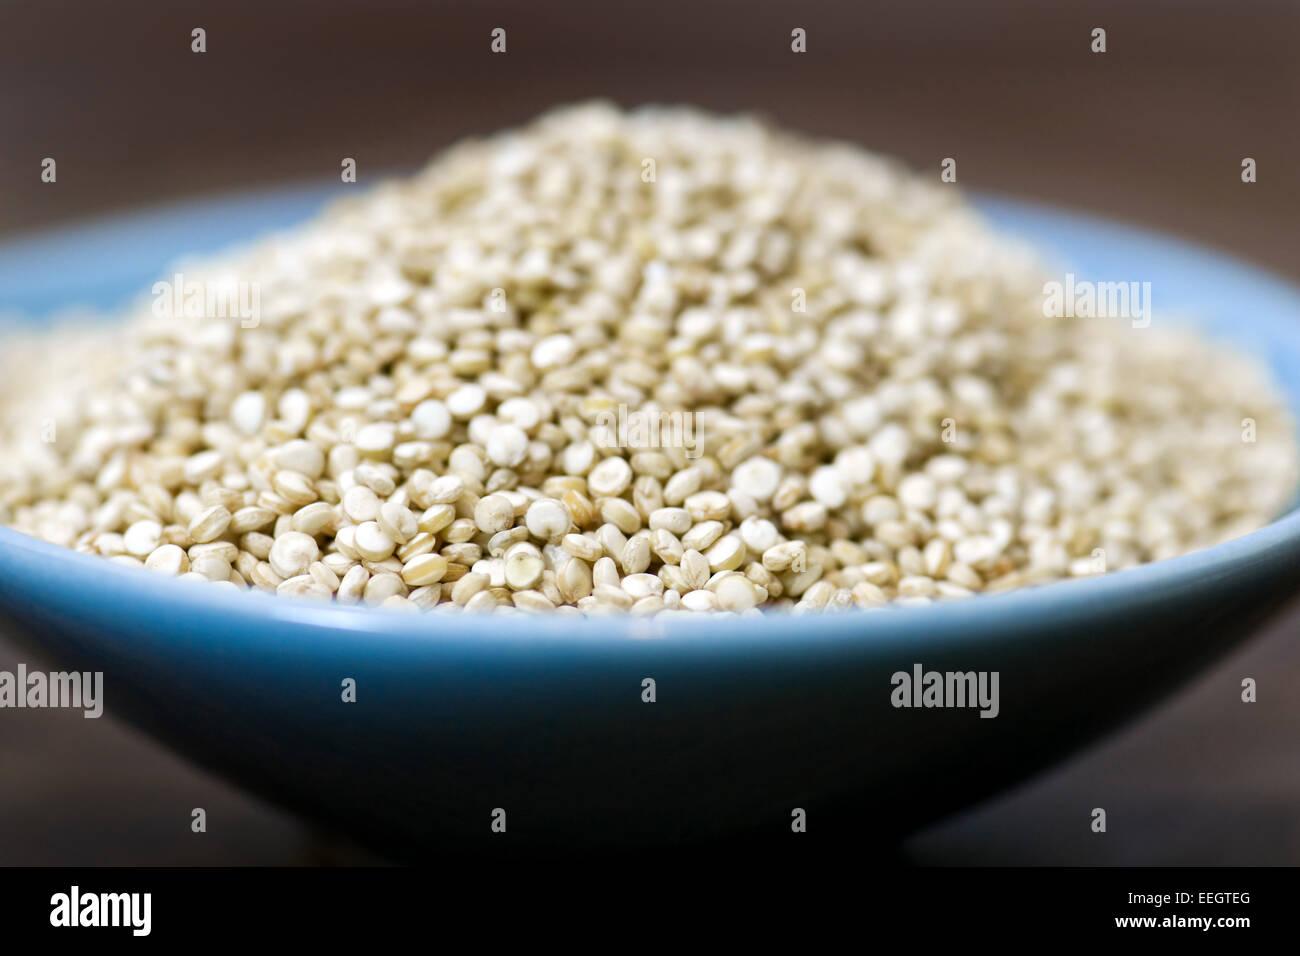 Petit bol bleu rempli de quinoa séchées Photo Stock